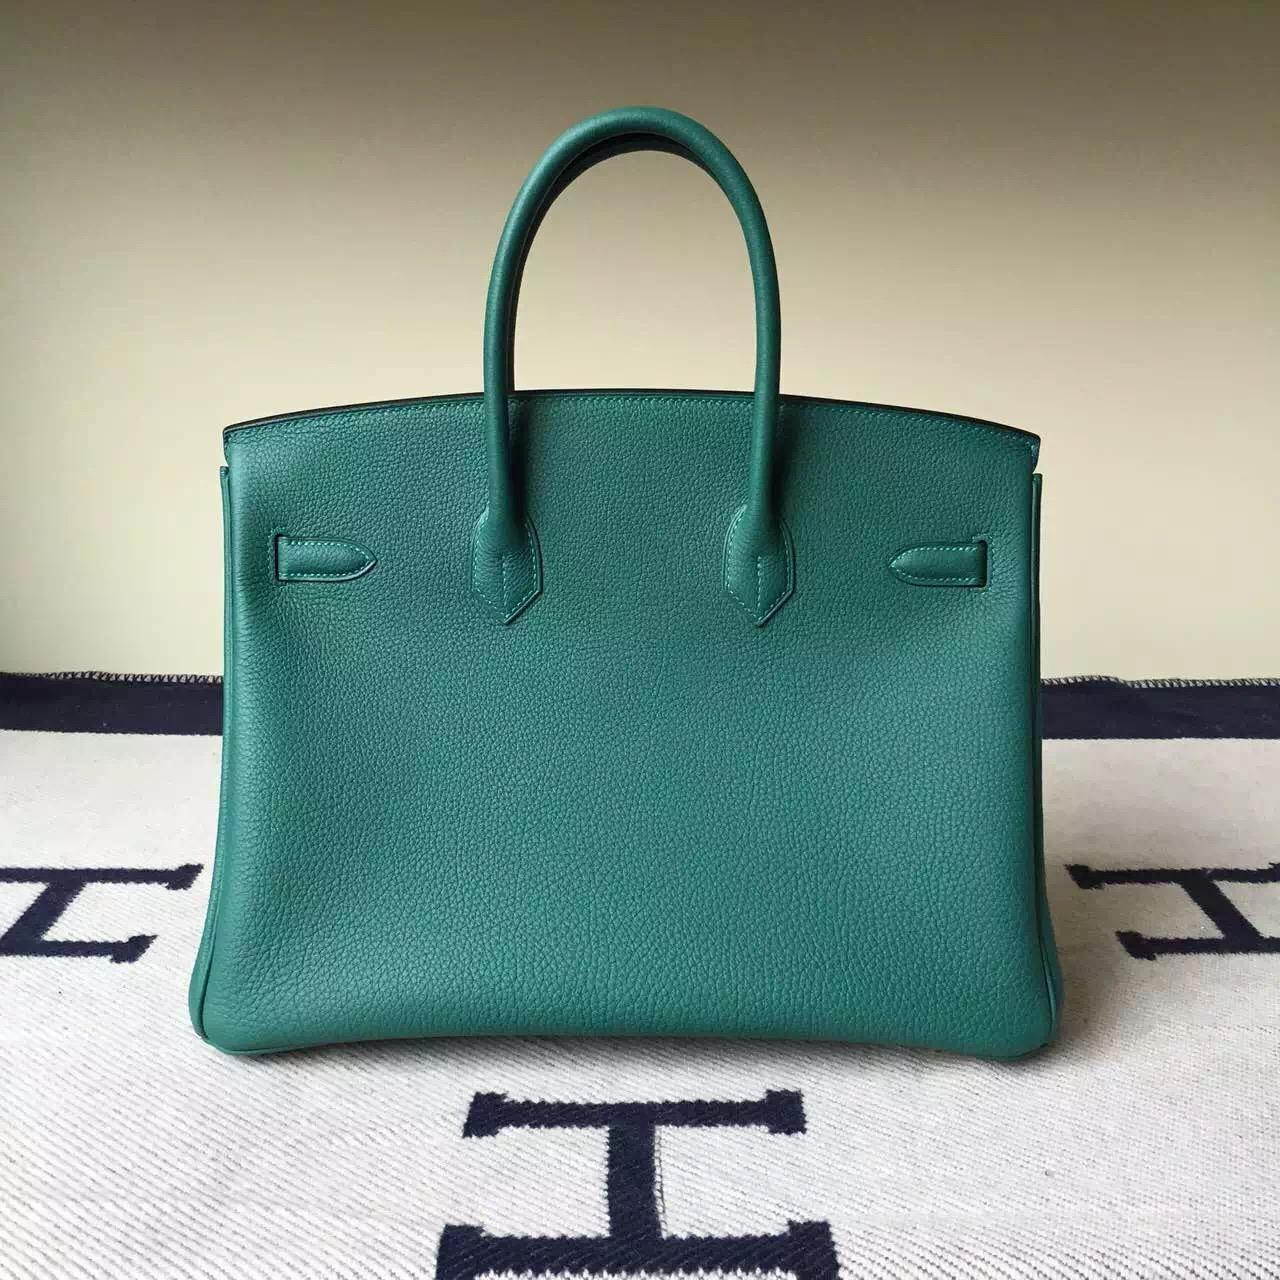 Sale Hermes Z6 Malachite Green Togo Calf Leather Birkin35cm Bag